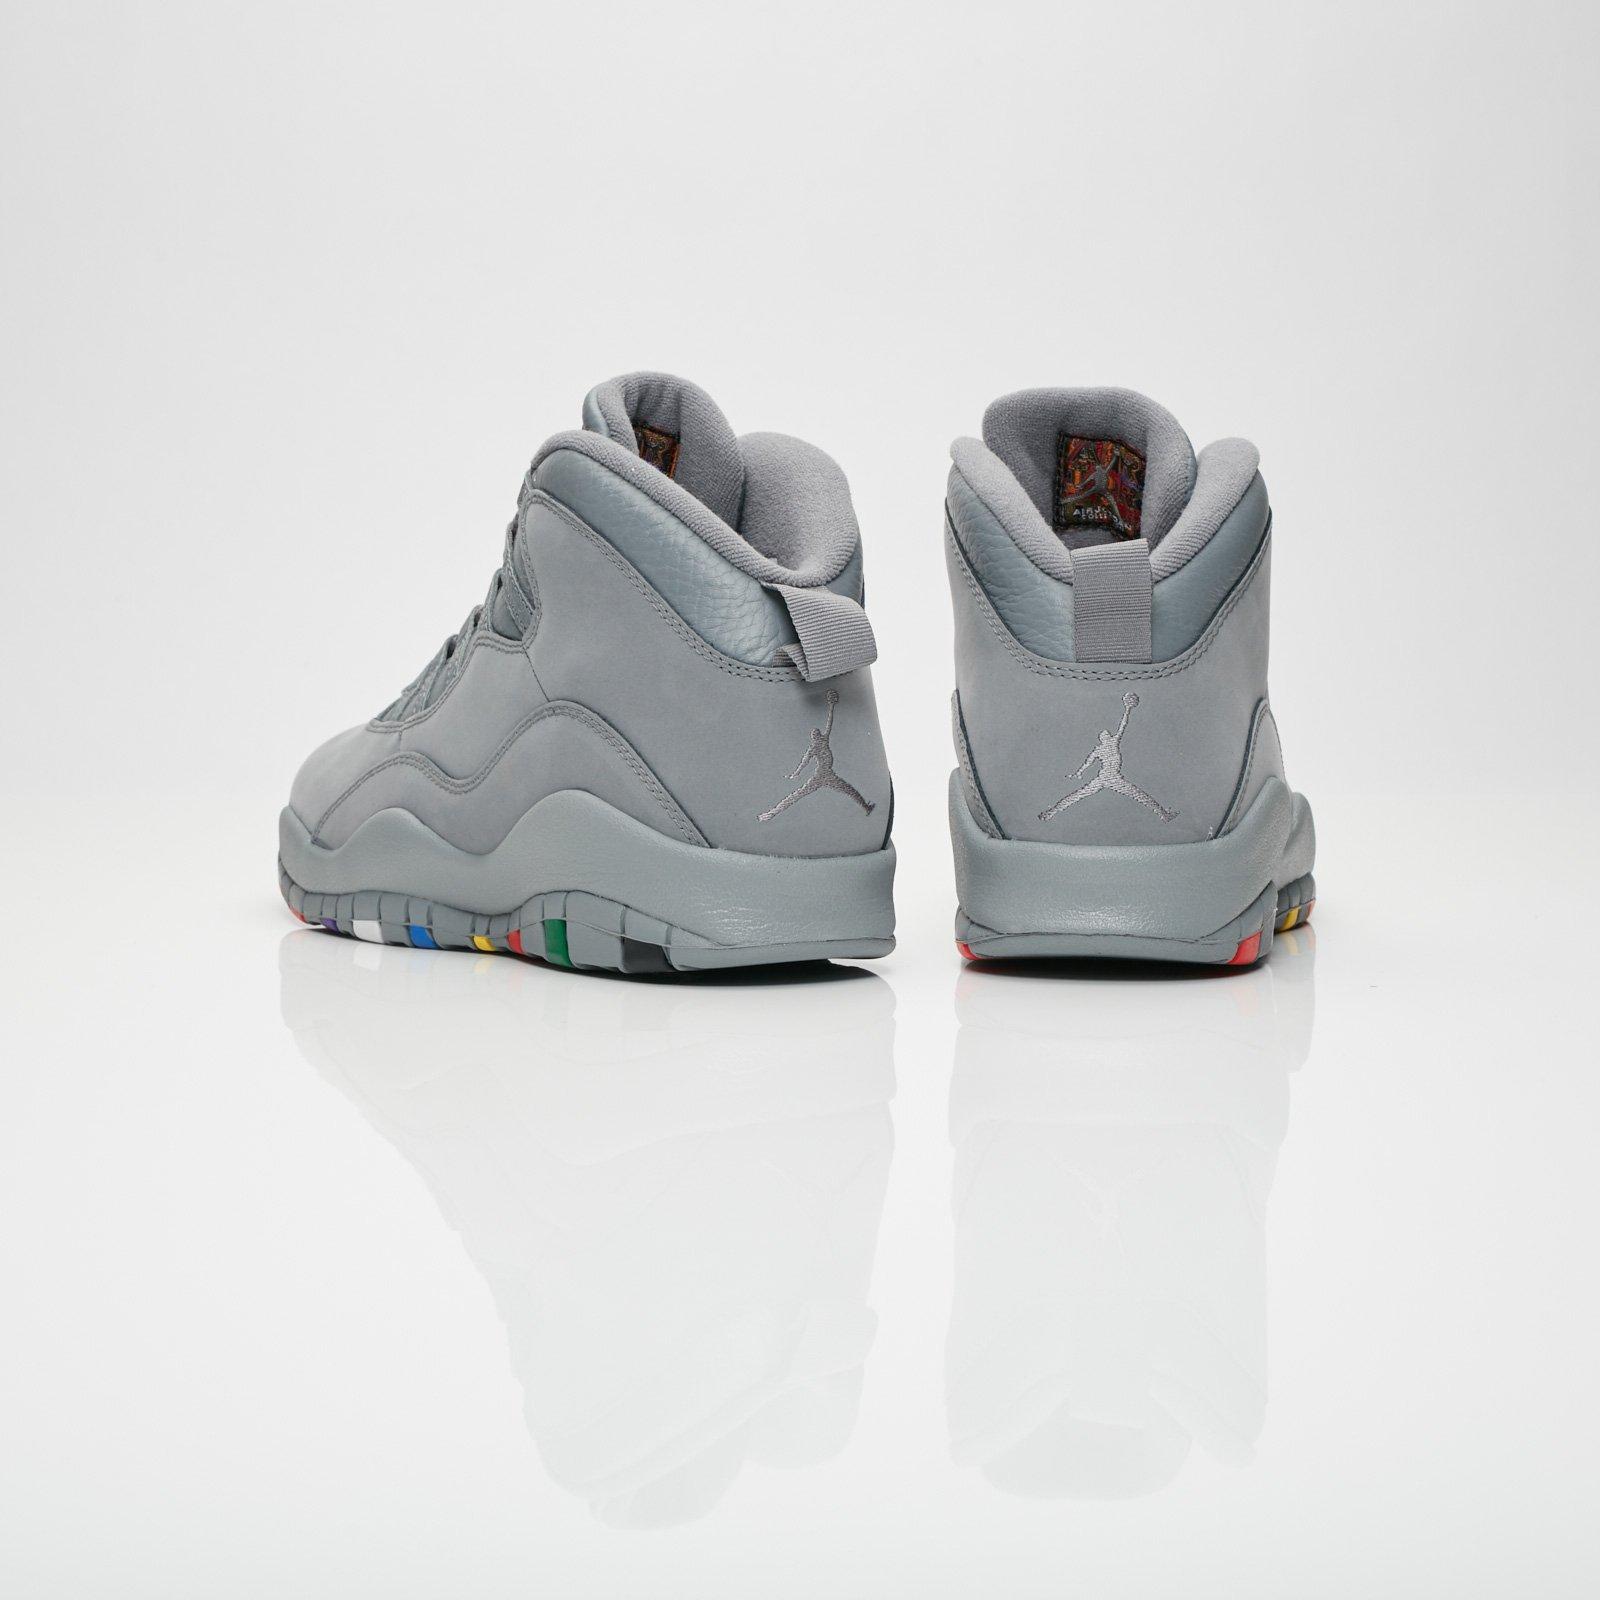 premium selection ef660 97f46 Jordan Brand Air Jordan 10 Retro - 310805-022 - Sneakersnstuff   sneakers    streetwear online since 1999